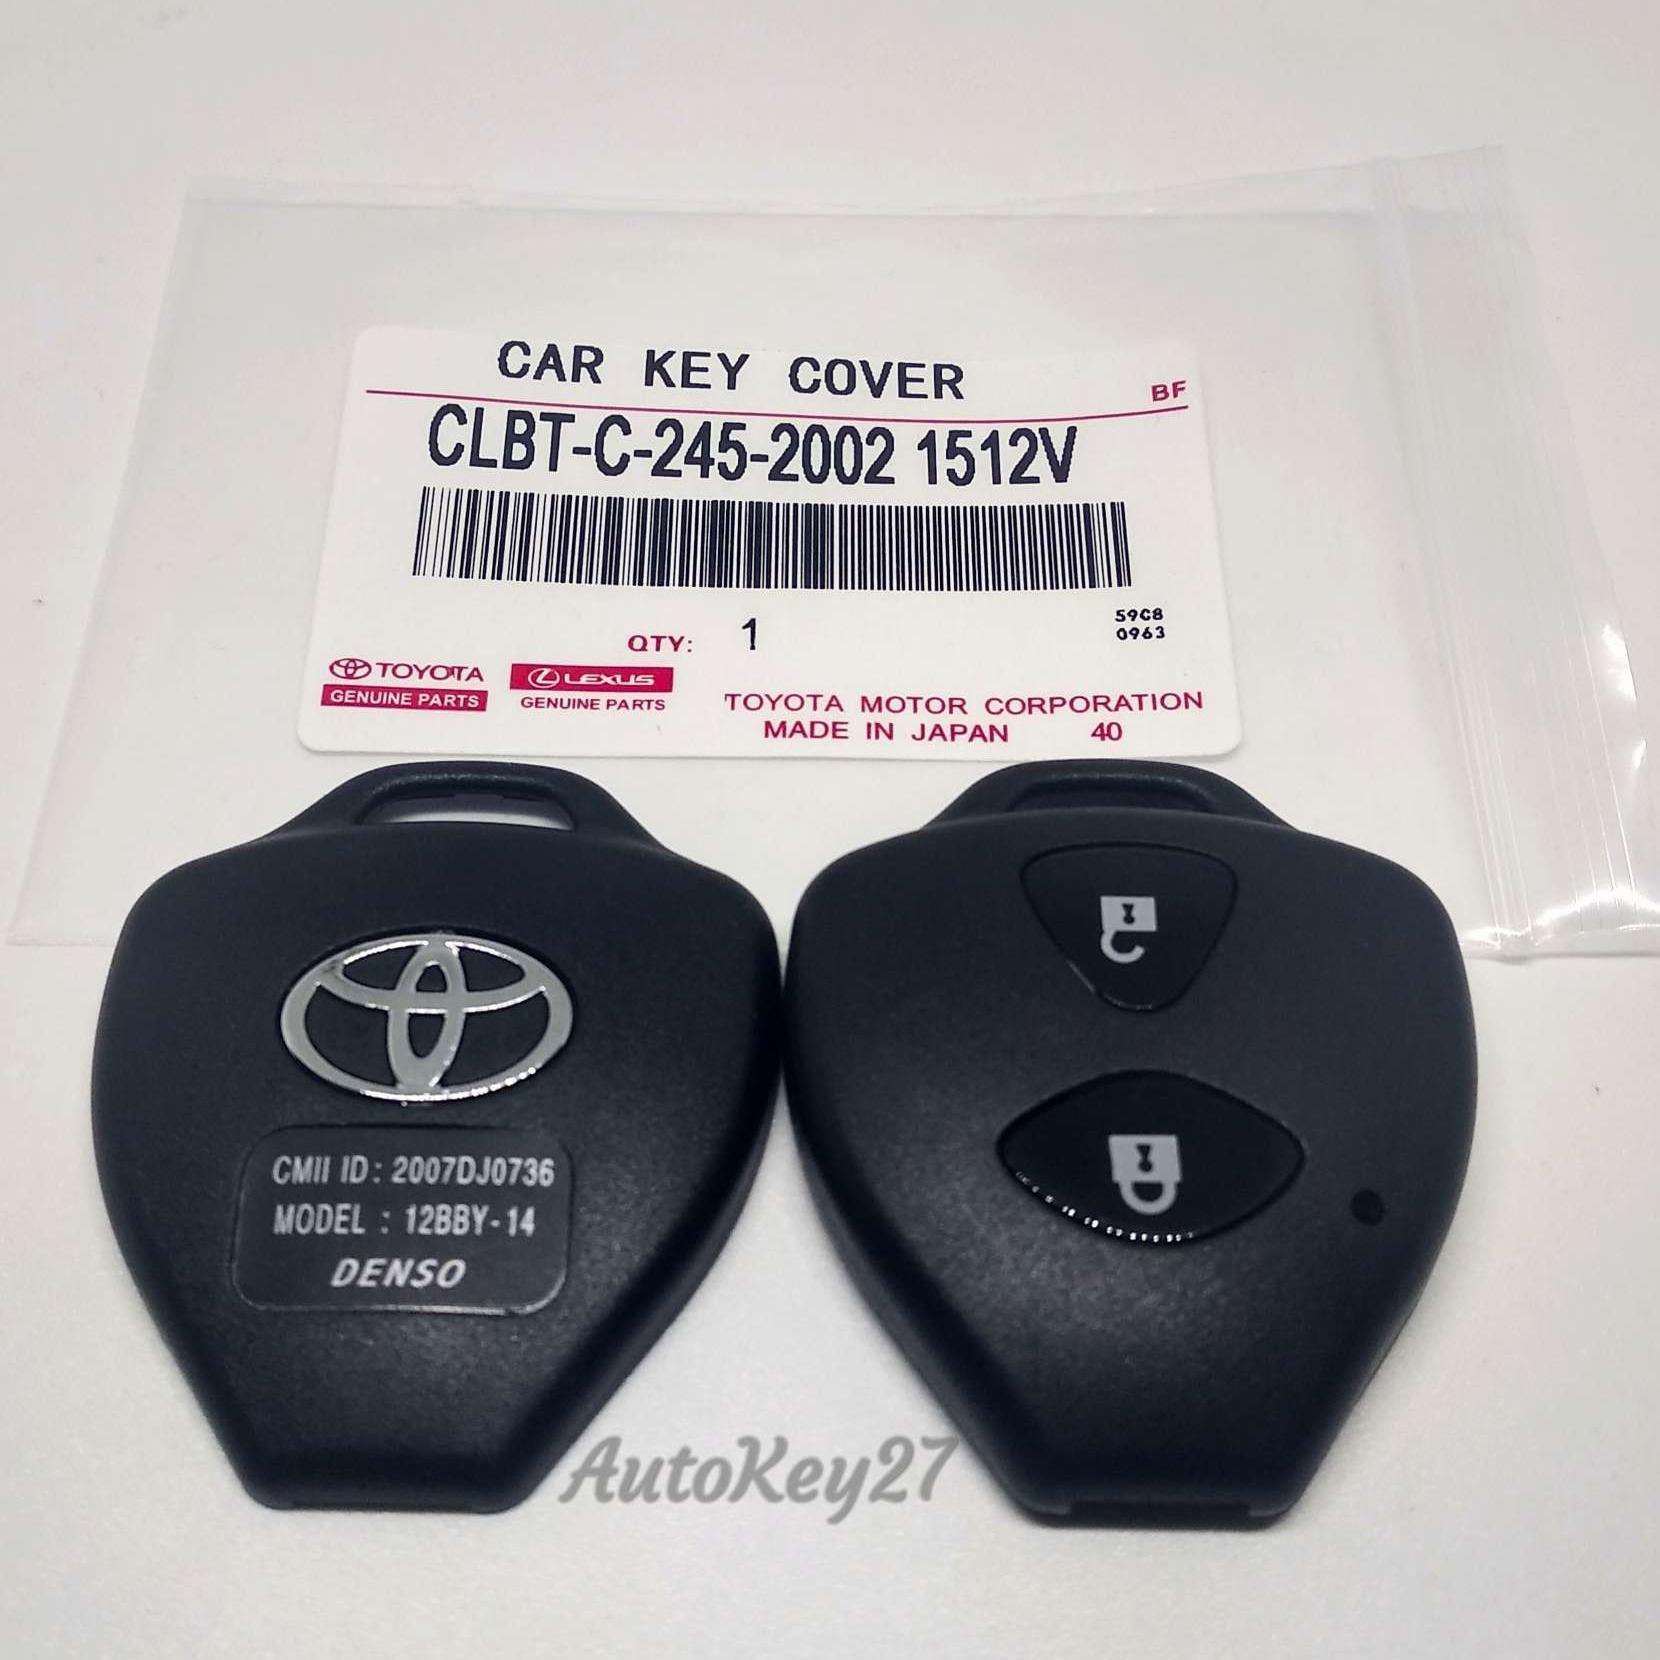 Buy Sell Cheapest Mobil Casing Kunci Best Quality Product Deals Lipat Filp Key Toyota Innova Fortuner Vios Altis 3 Tombol Rumah Yaris 2 Oem